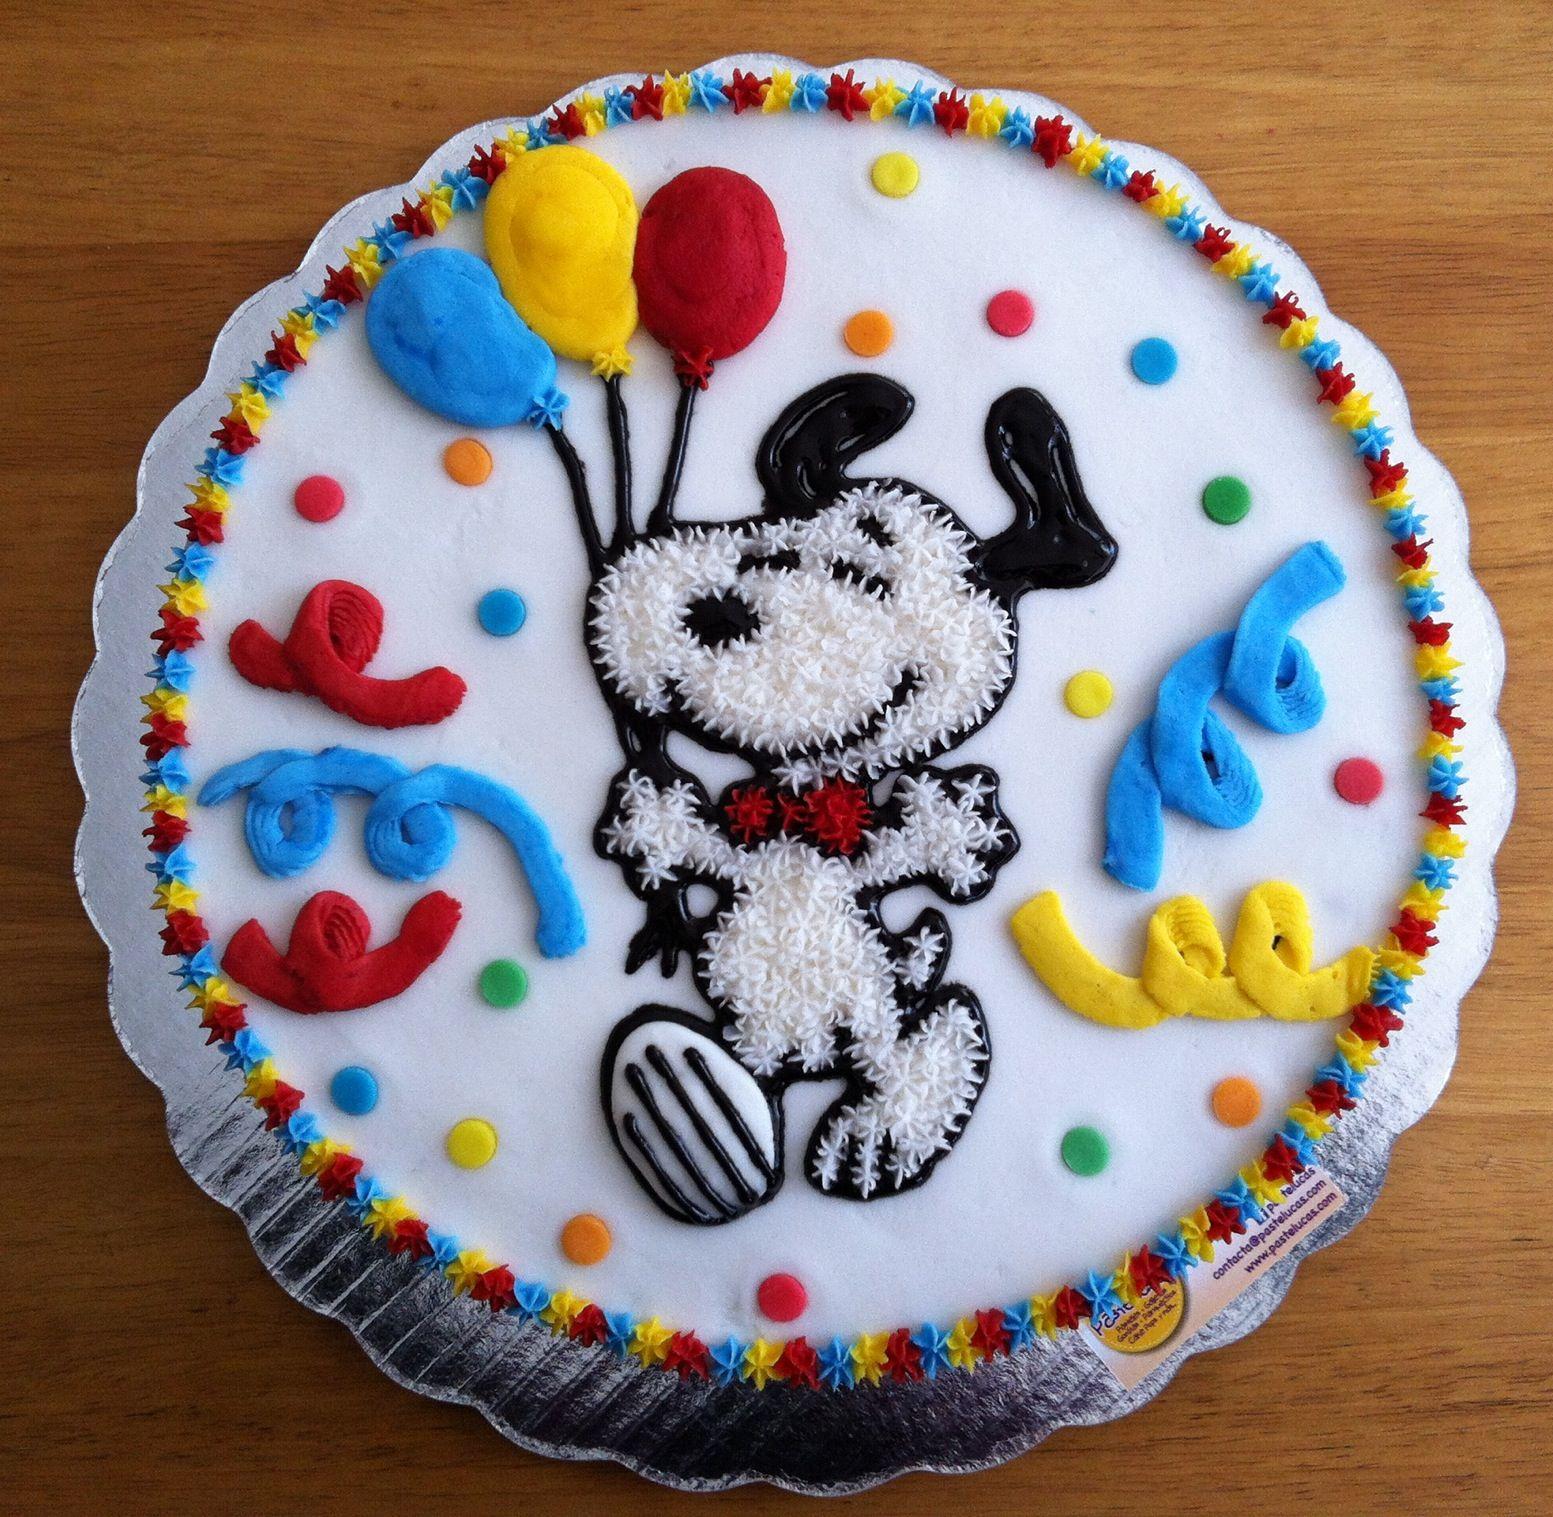 Snoopy Cake Photo Cake Ideas And Designs